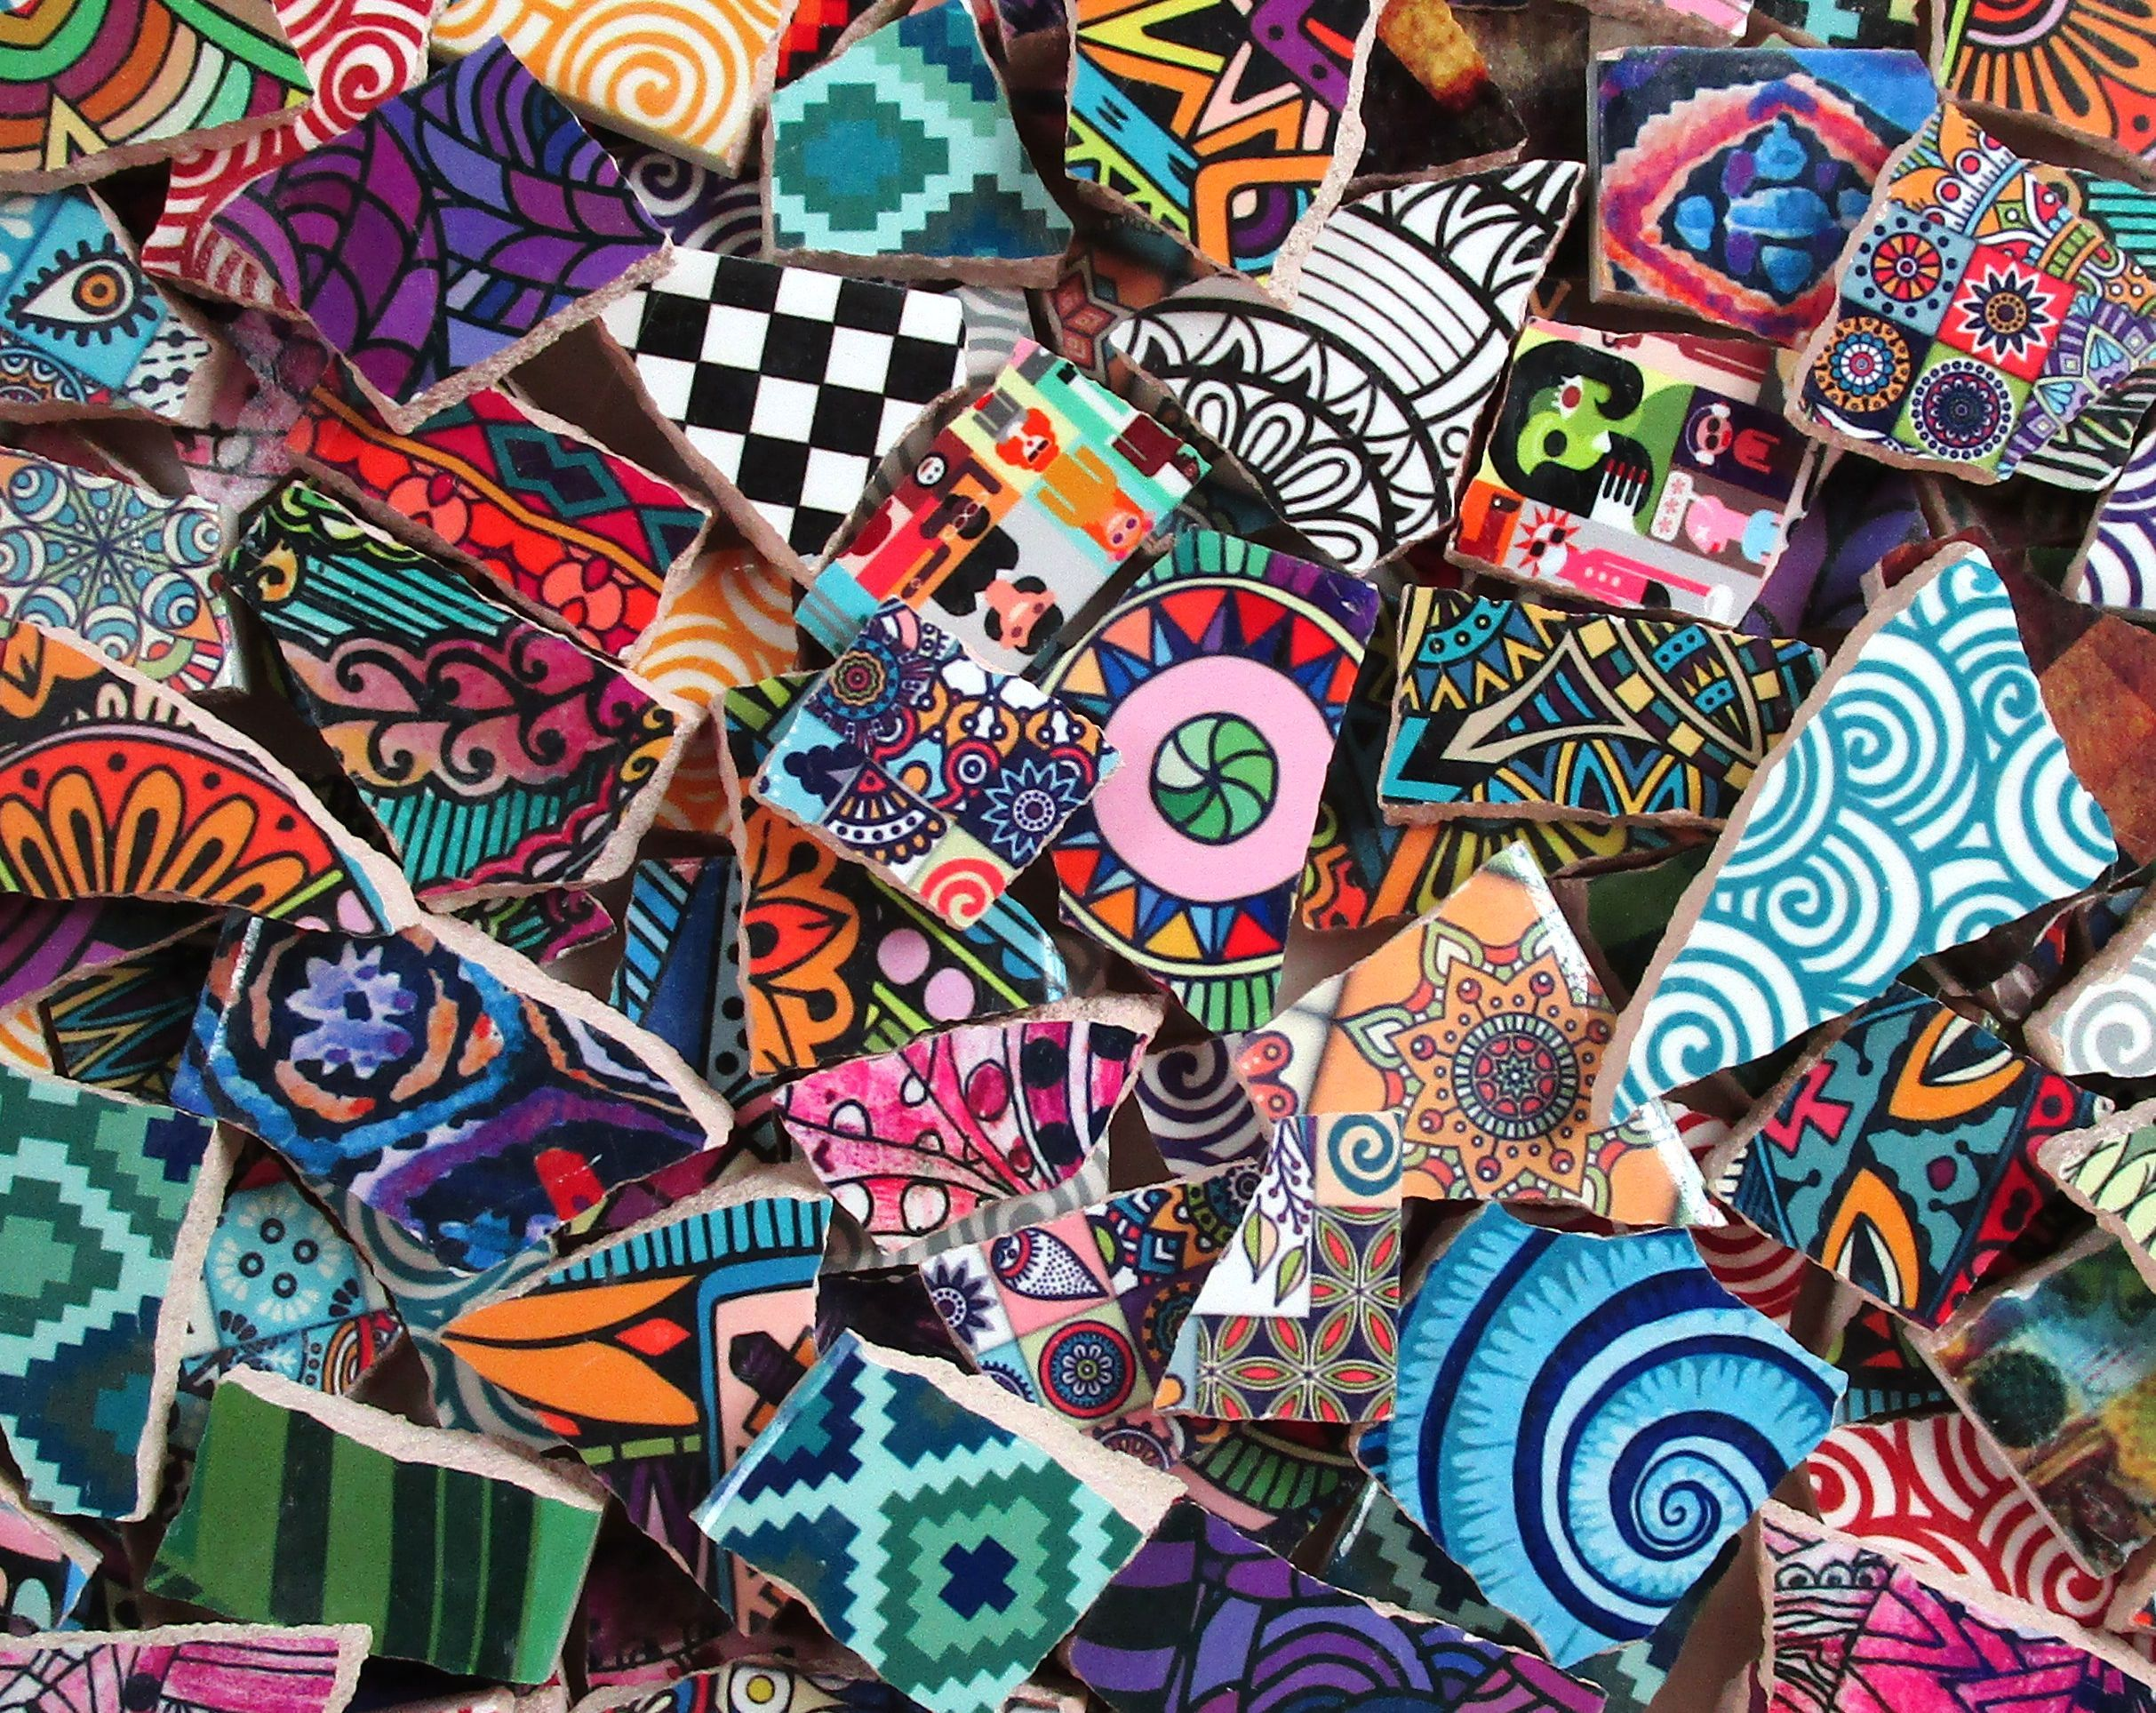 Closeout Sale Bulk Mosaic Tiles 2 Pounds Mixed Bright Abstract Art Designs Mixed Tile Pieces Bulk Mosaic Tiles Mosaic Made Ready To Ship Bright Abstract Art